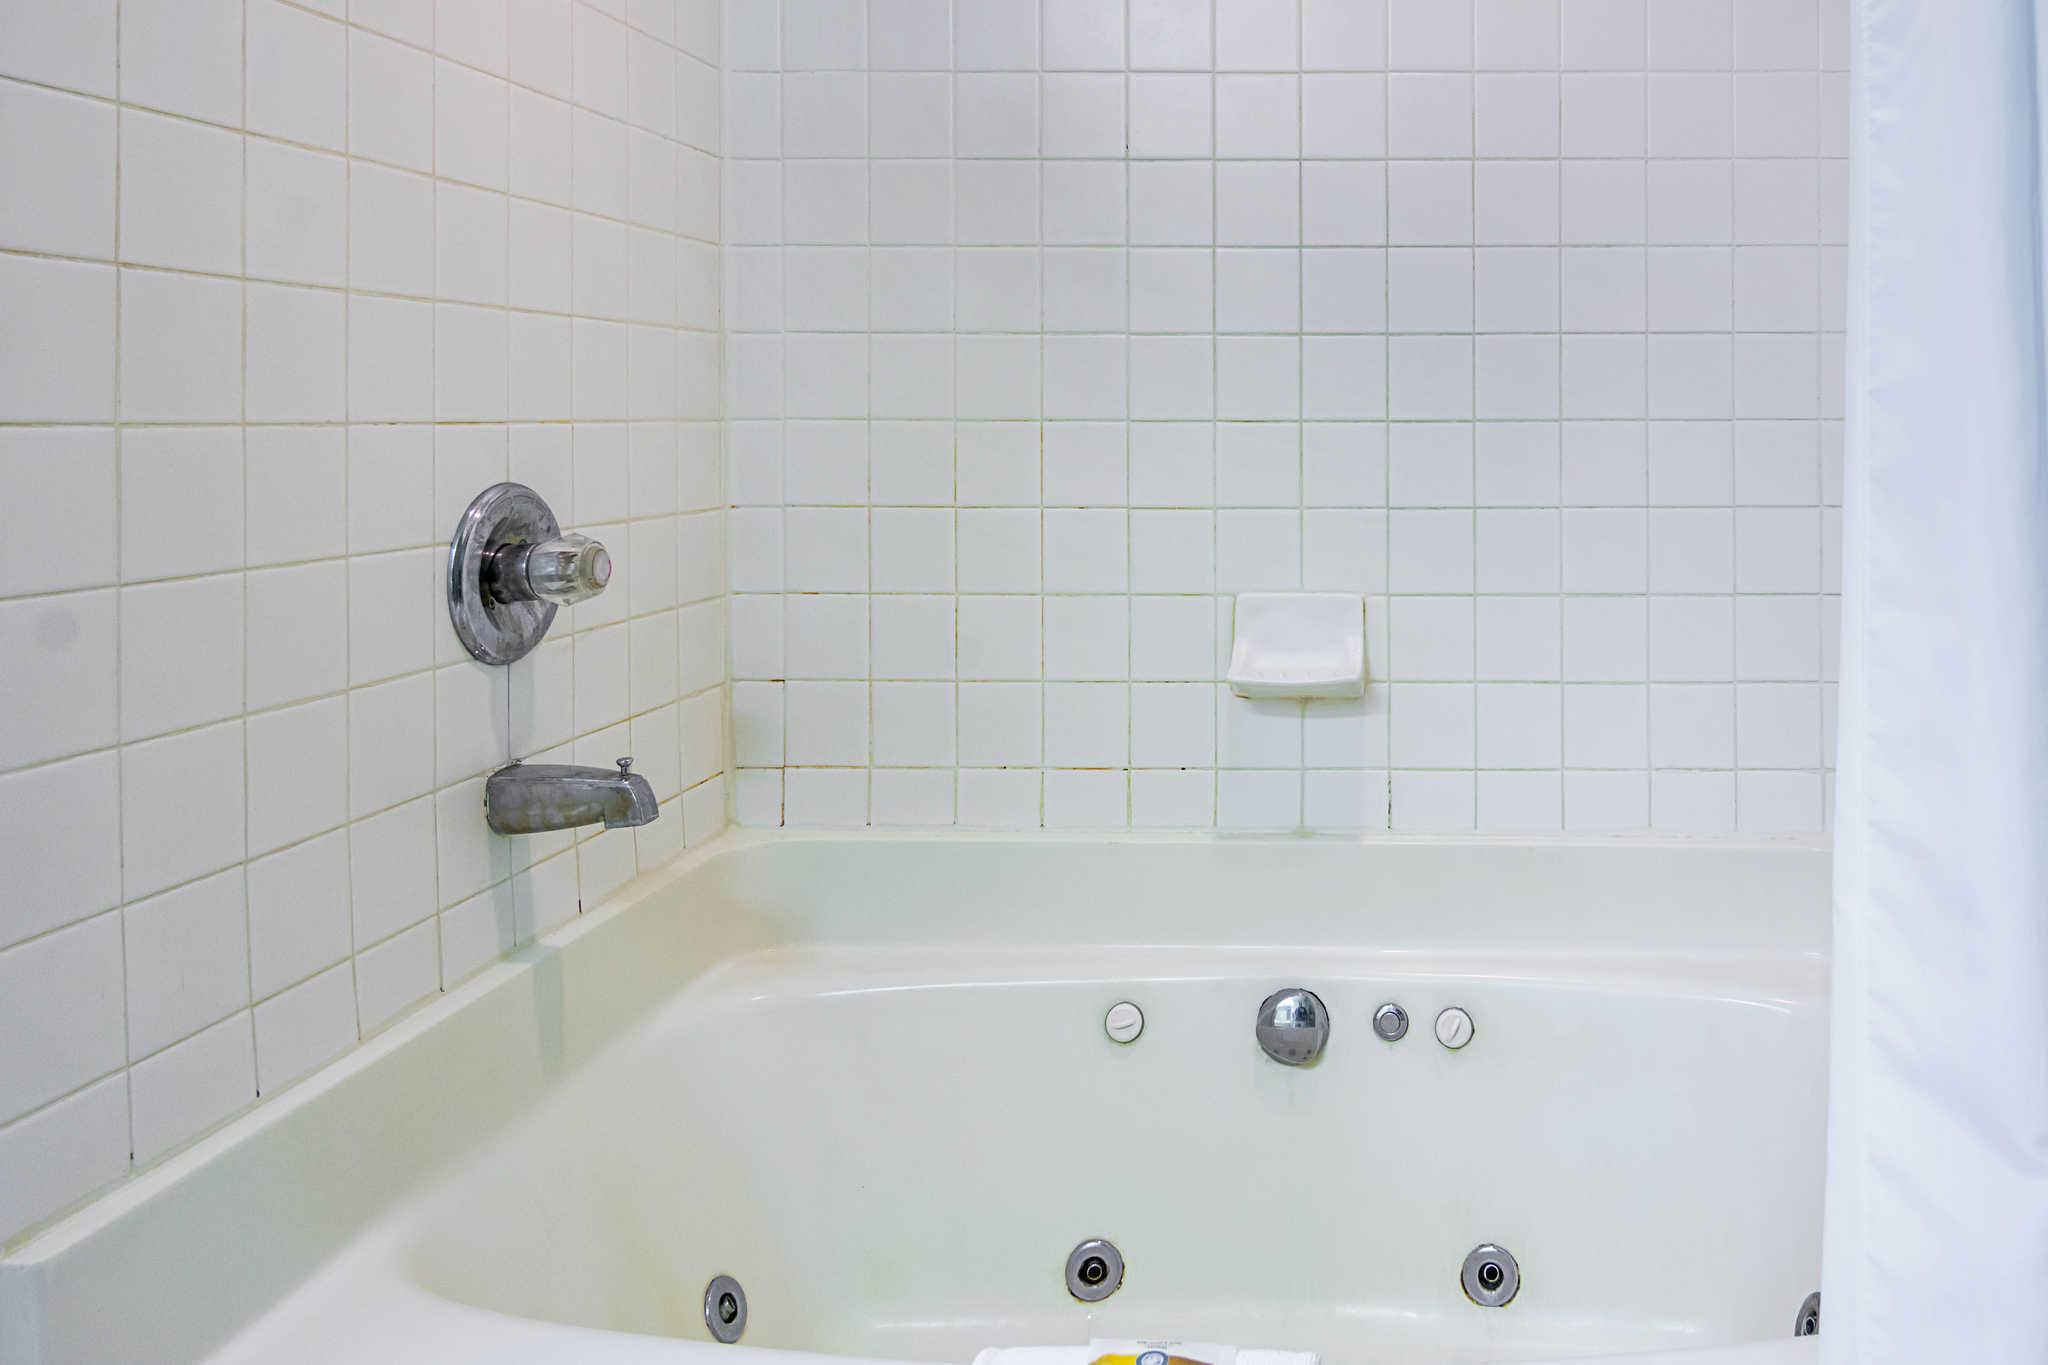 Quality Inn & Suites Kearneysville - Martinsburg image 19